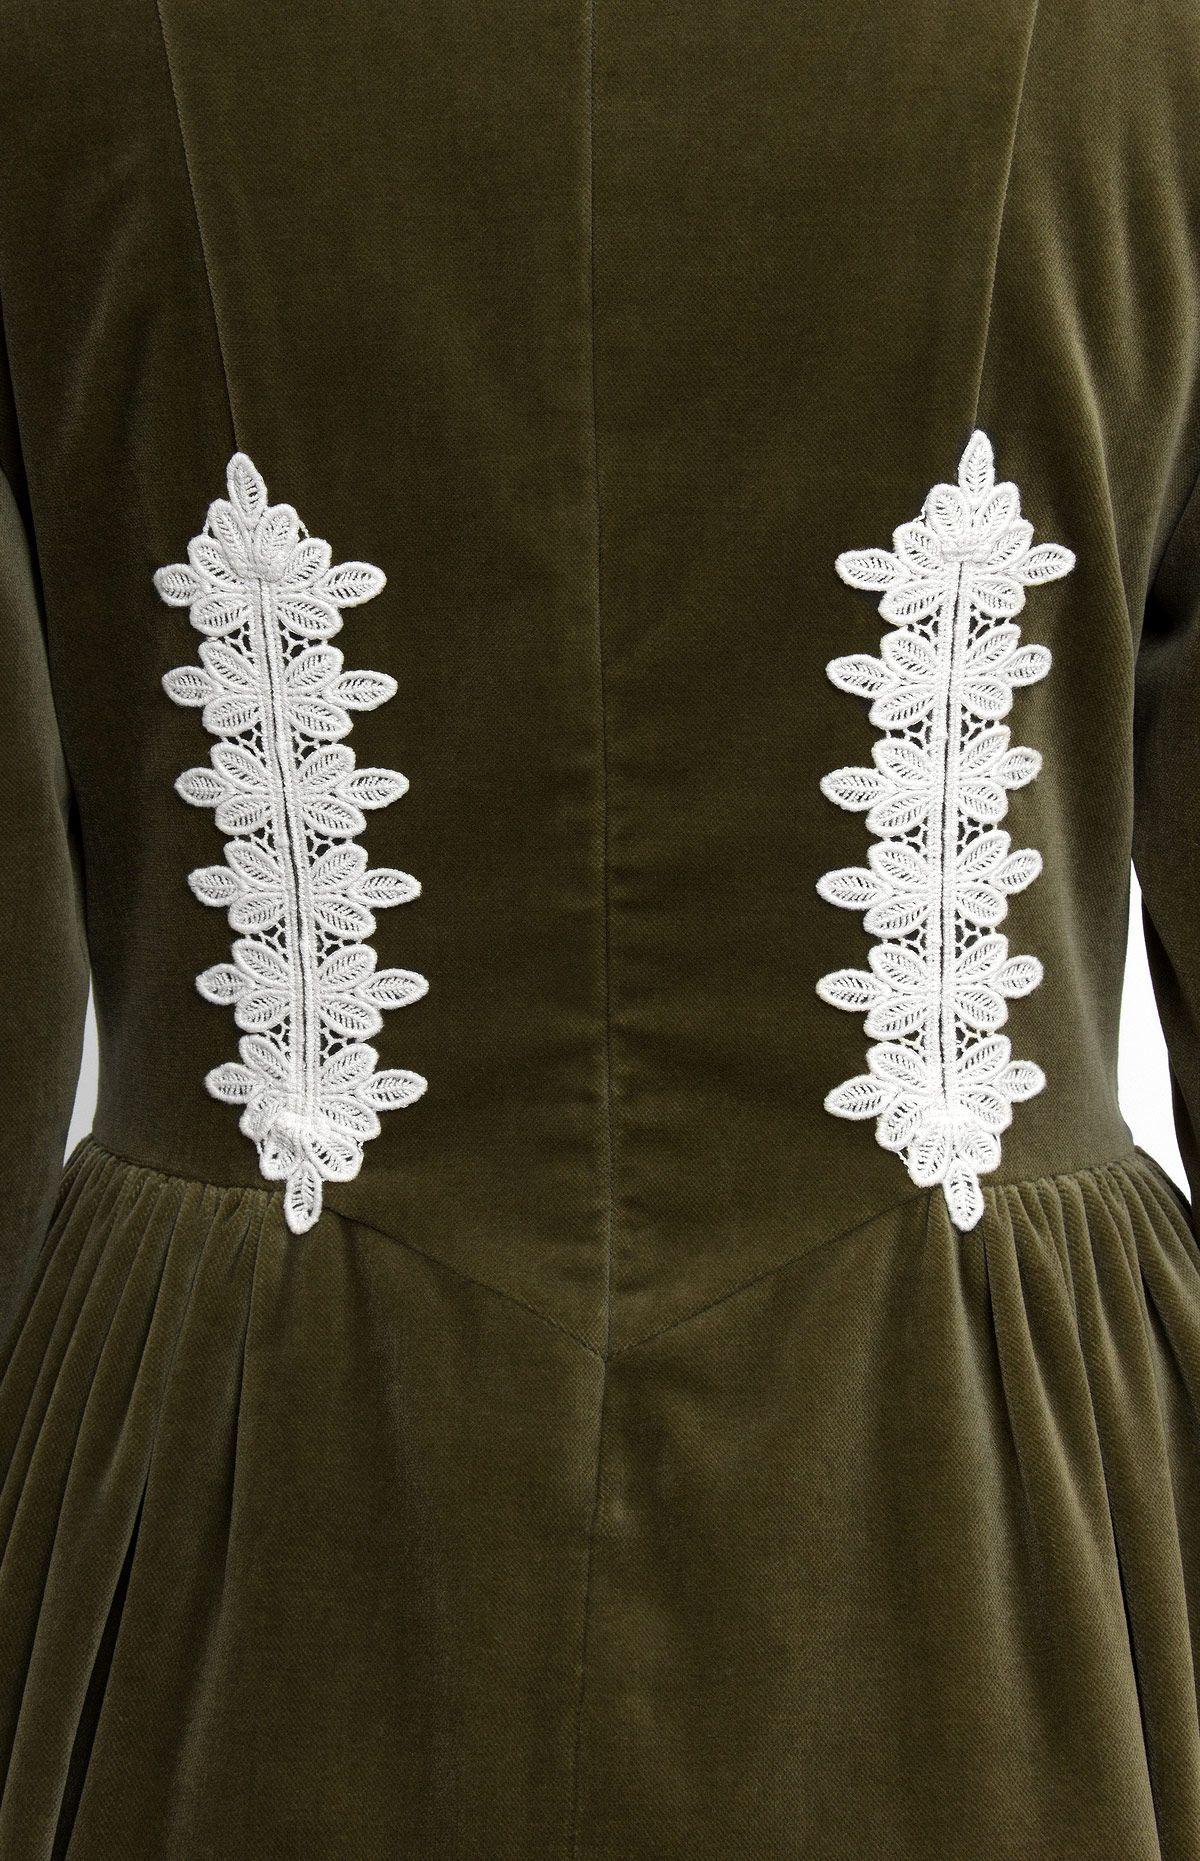 Longsleeve cotton velvet dress with cotton lace finish mandarin